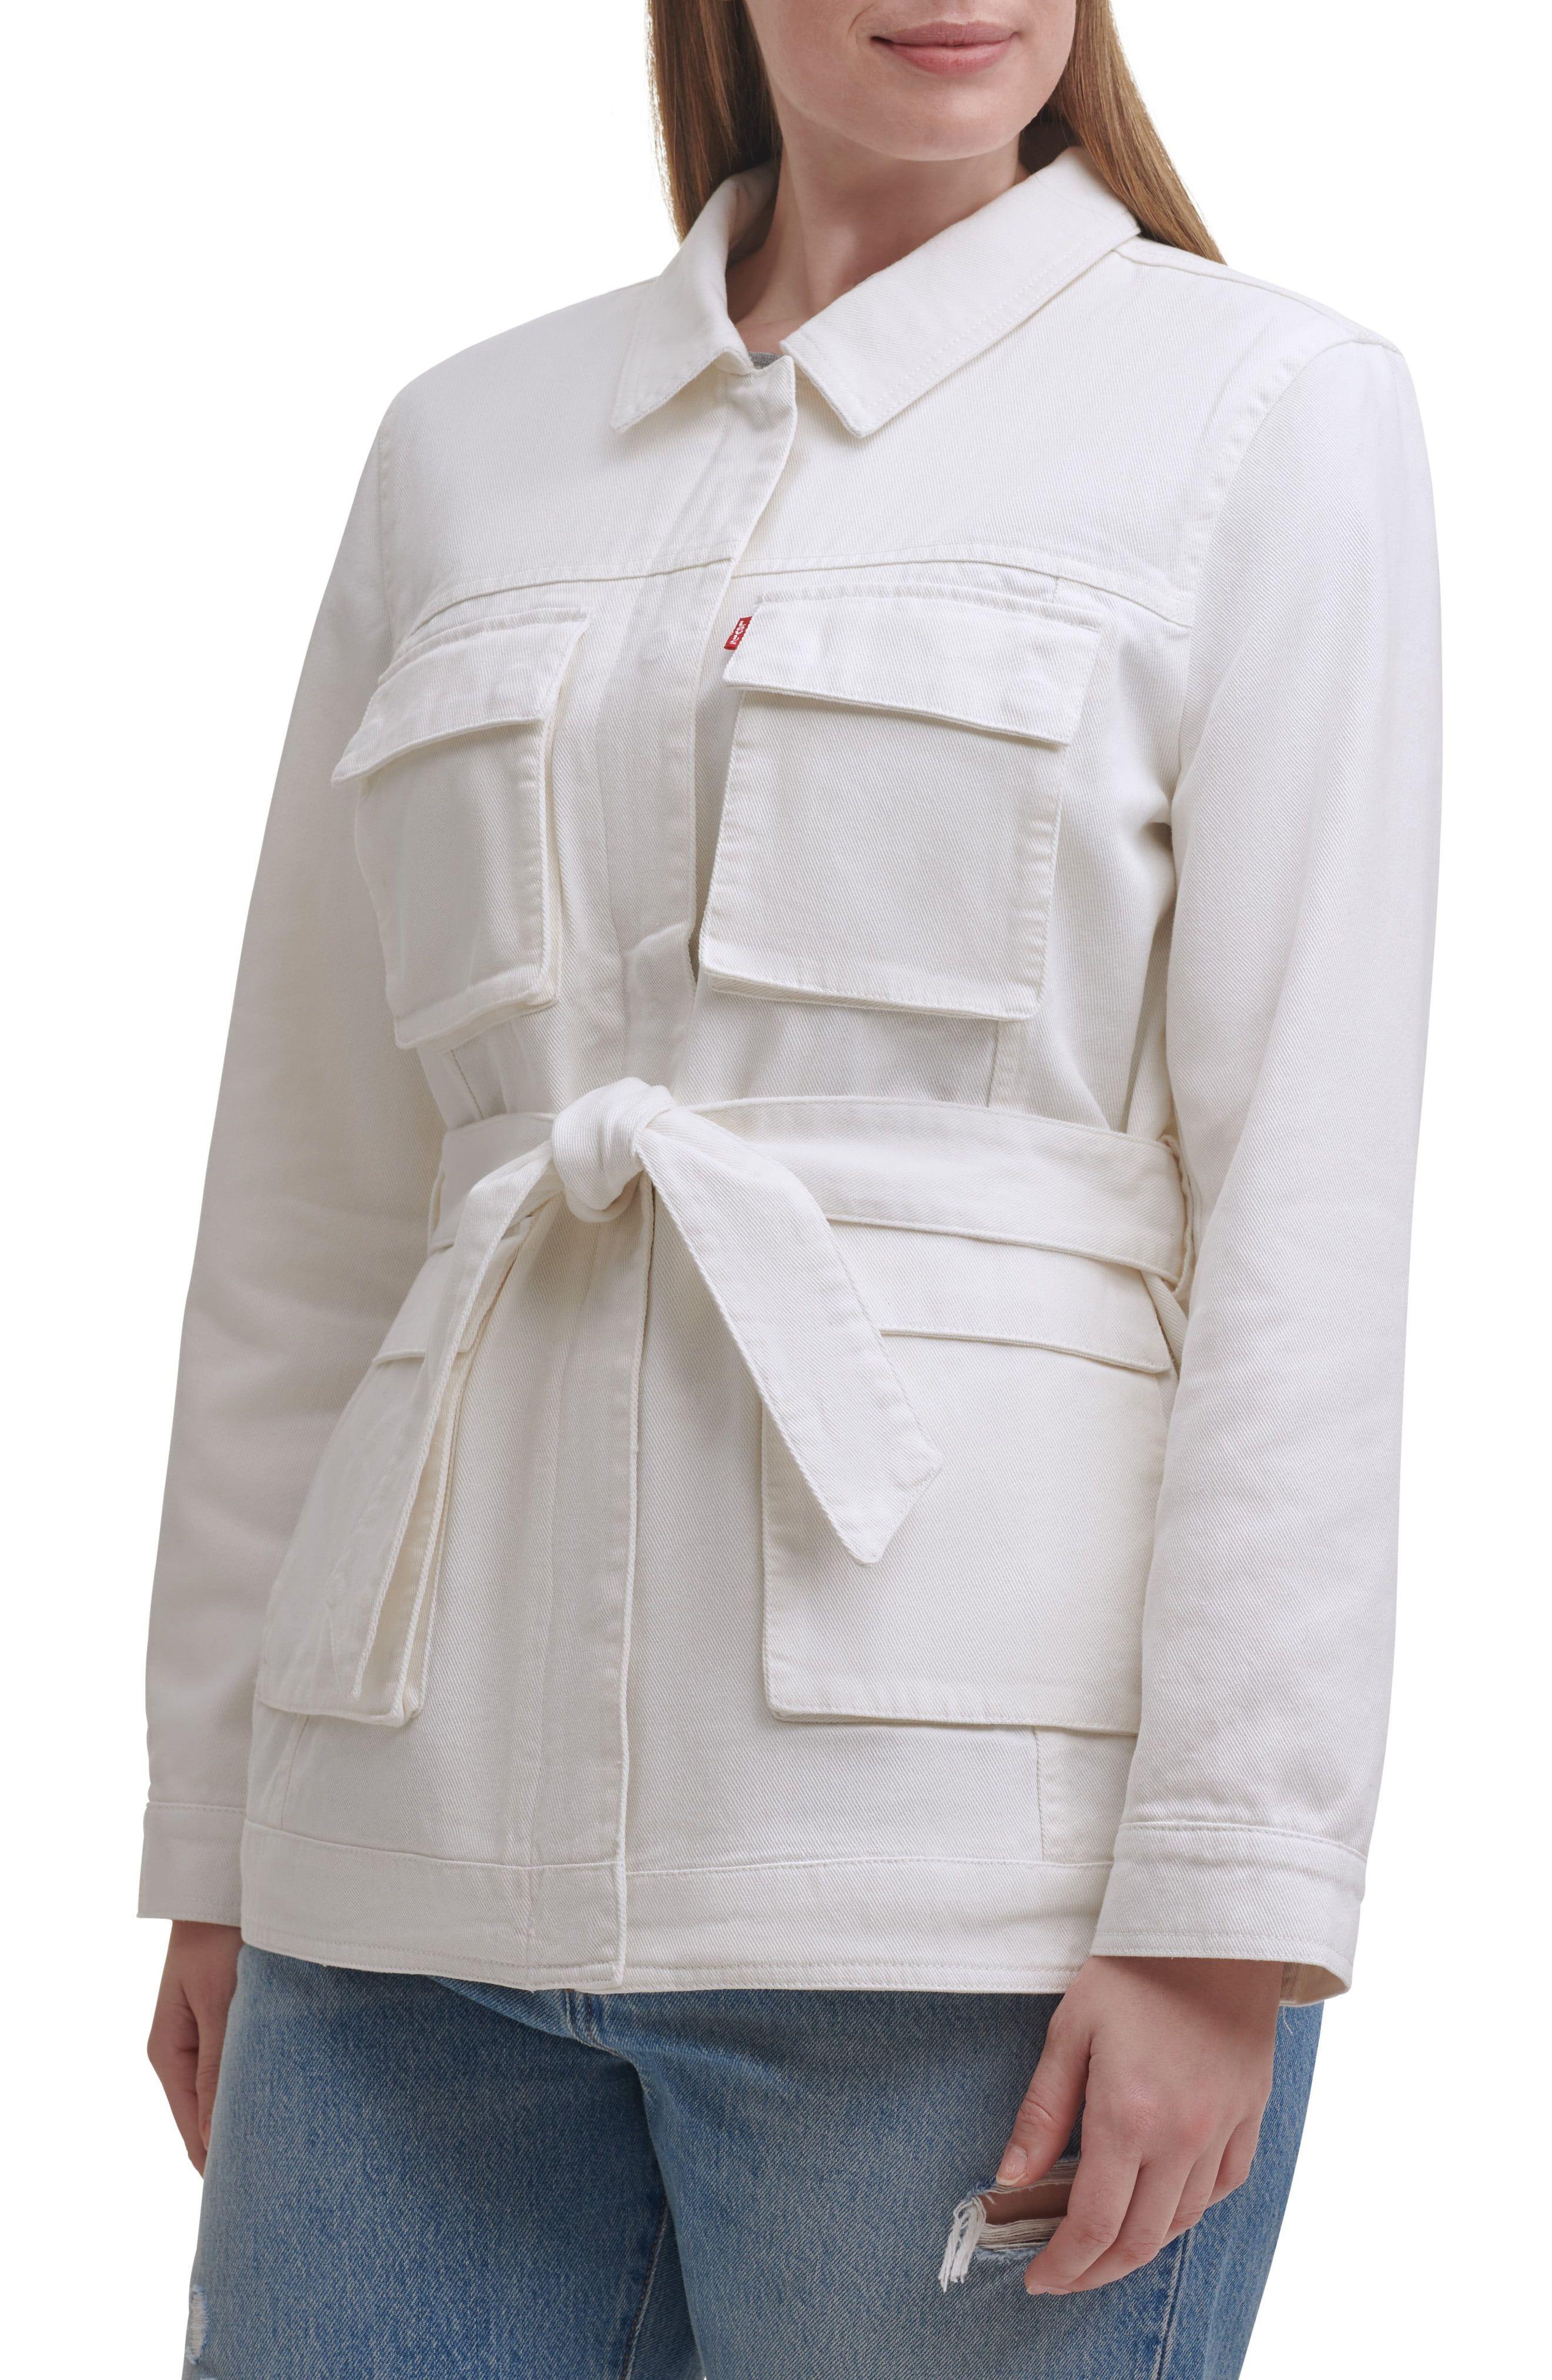 Plus Size Women S Levi S Safari Denim Jacket Size 3x White In 2021 Casual Denim Jacket Plus Size Women Denim Jacket [ 4048 x 2640 Pixel ]